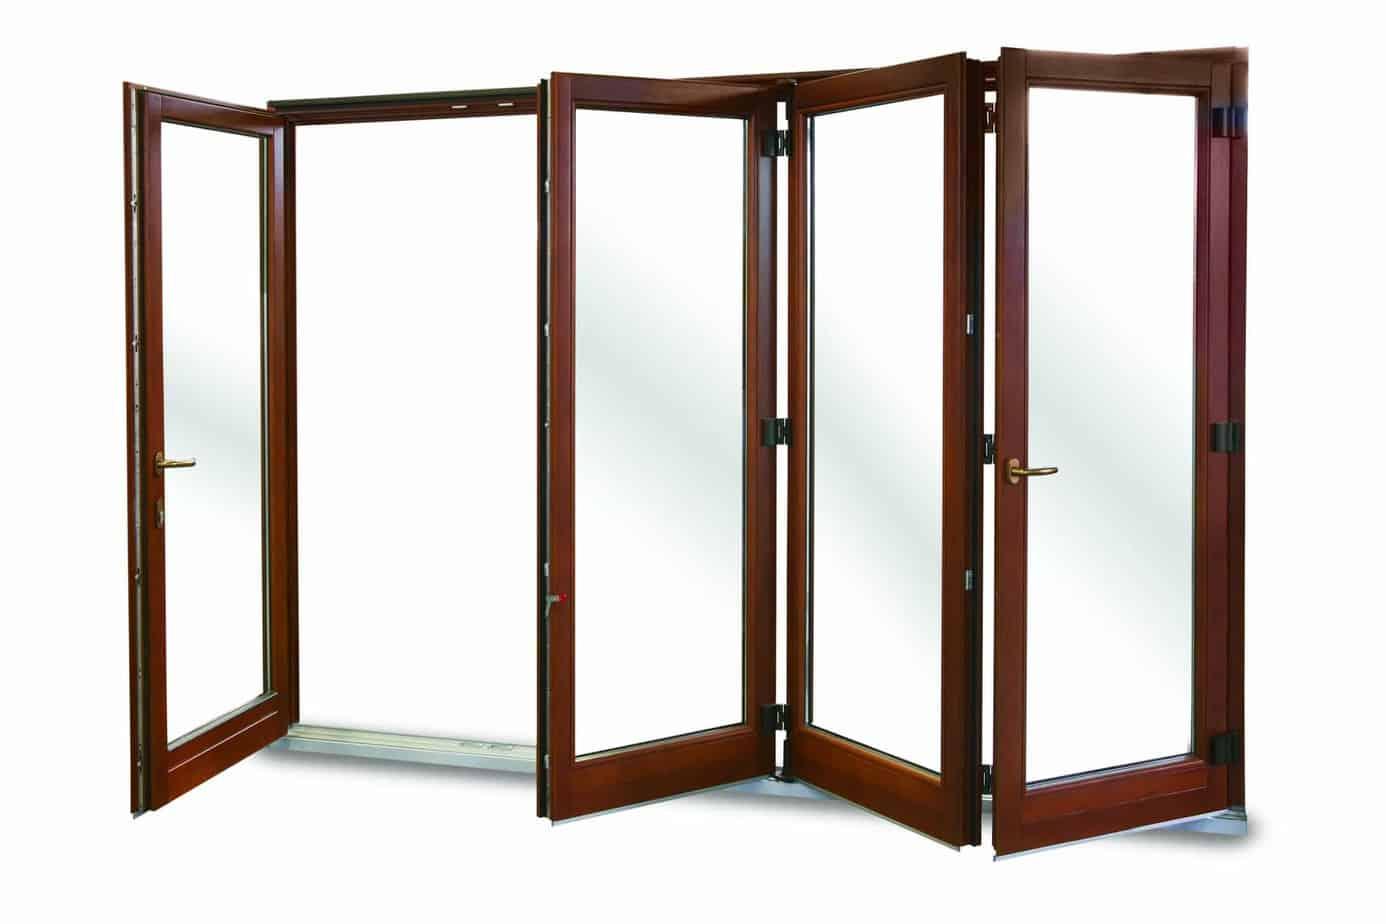 Composite bi fold sliding doors camel glass windows for Bi fold sliding glass doors